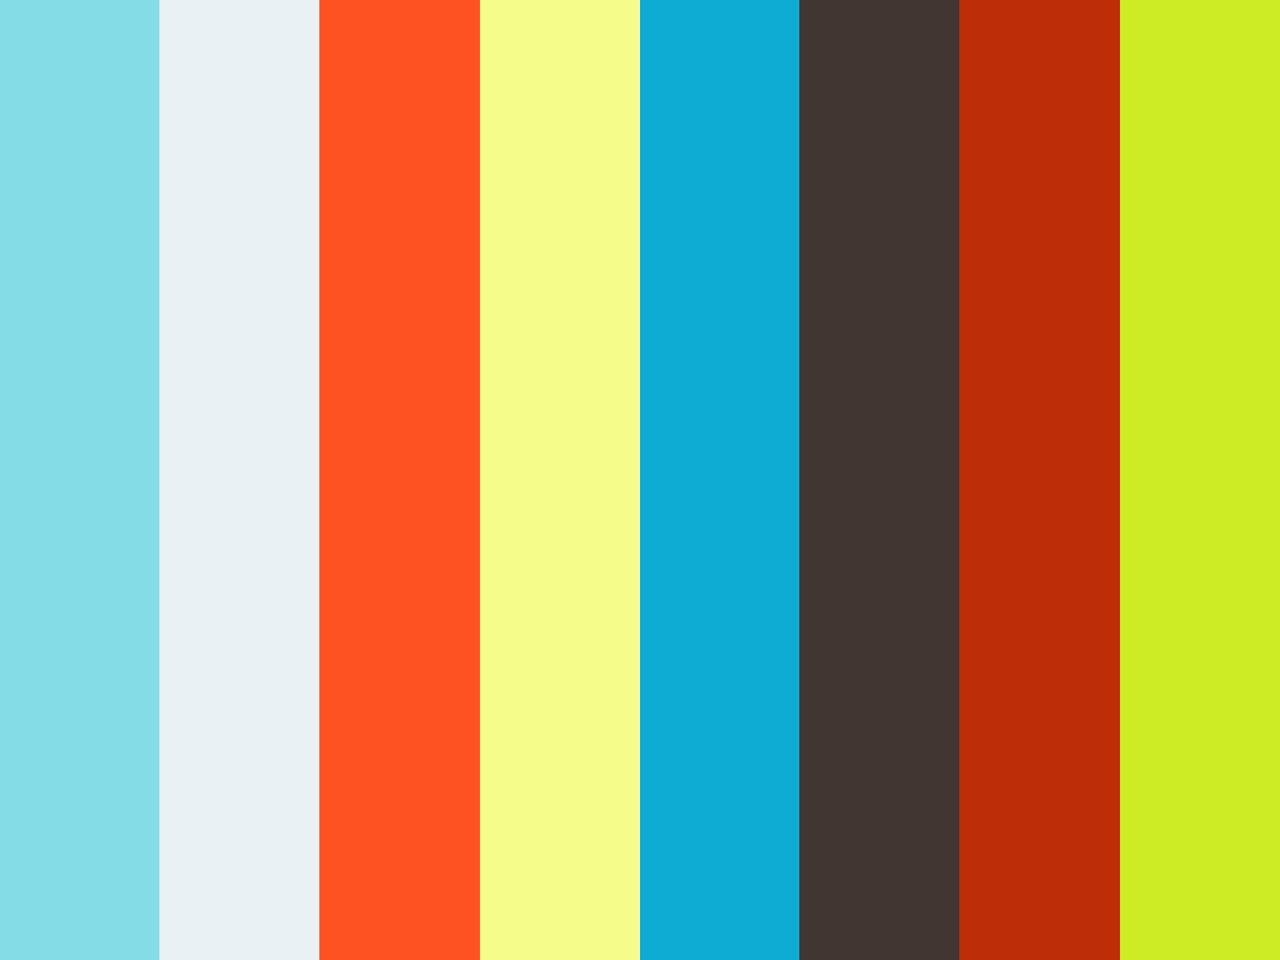 """Trumpy Trump"" - The Cooties f/ Reggie Watts"